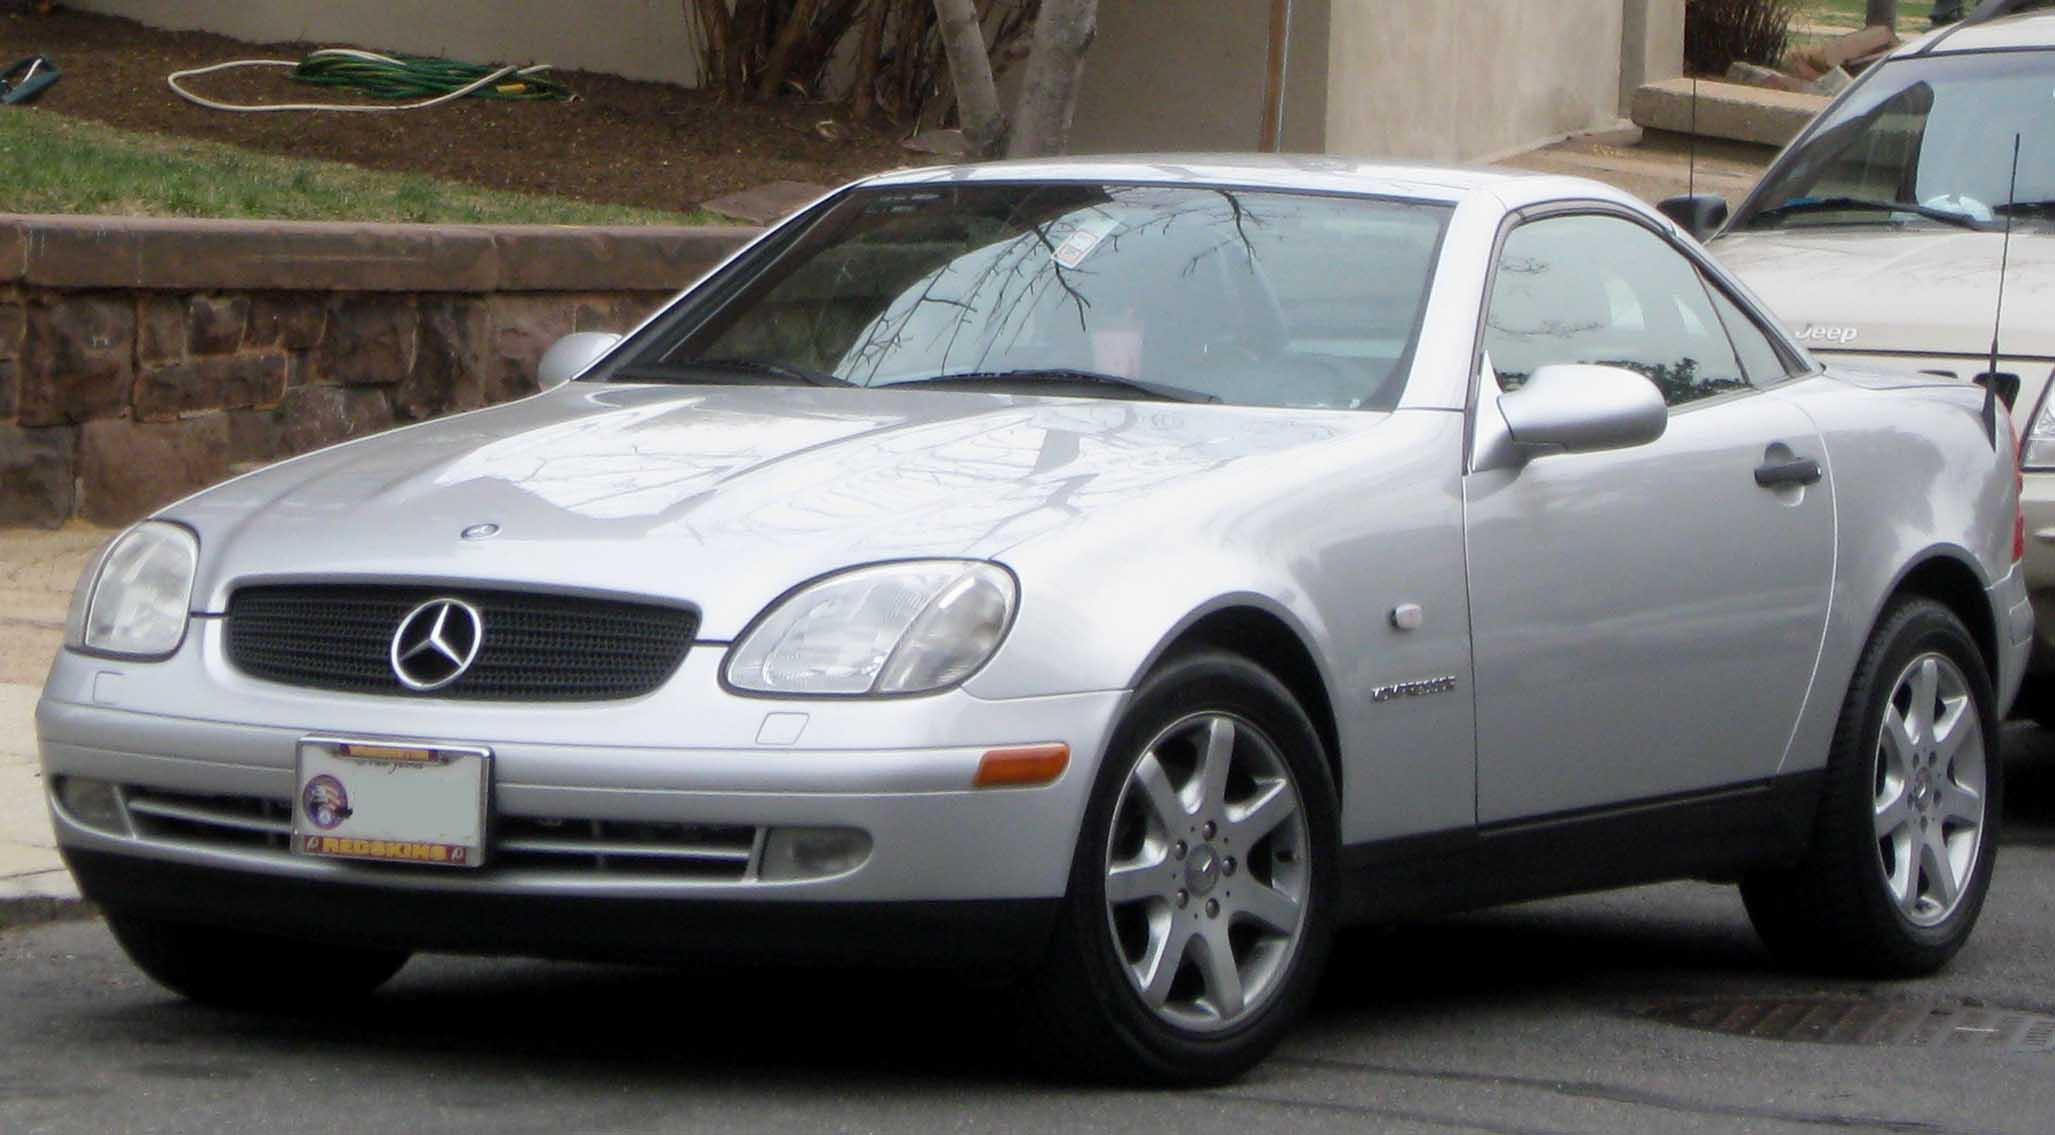 2005 Mercedes Benz Slk Class Information And Photos Zombiedrive